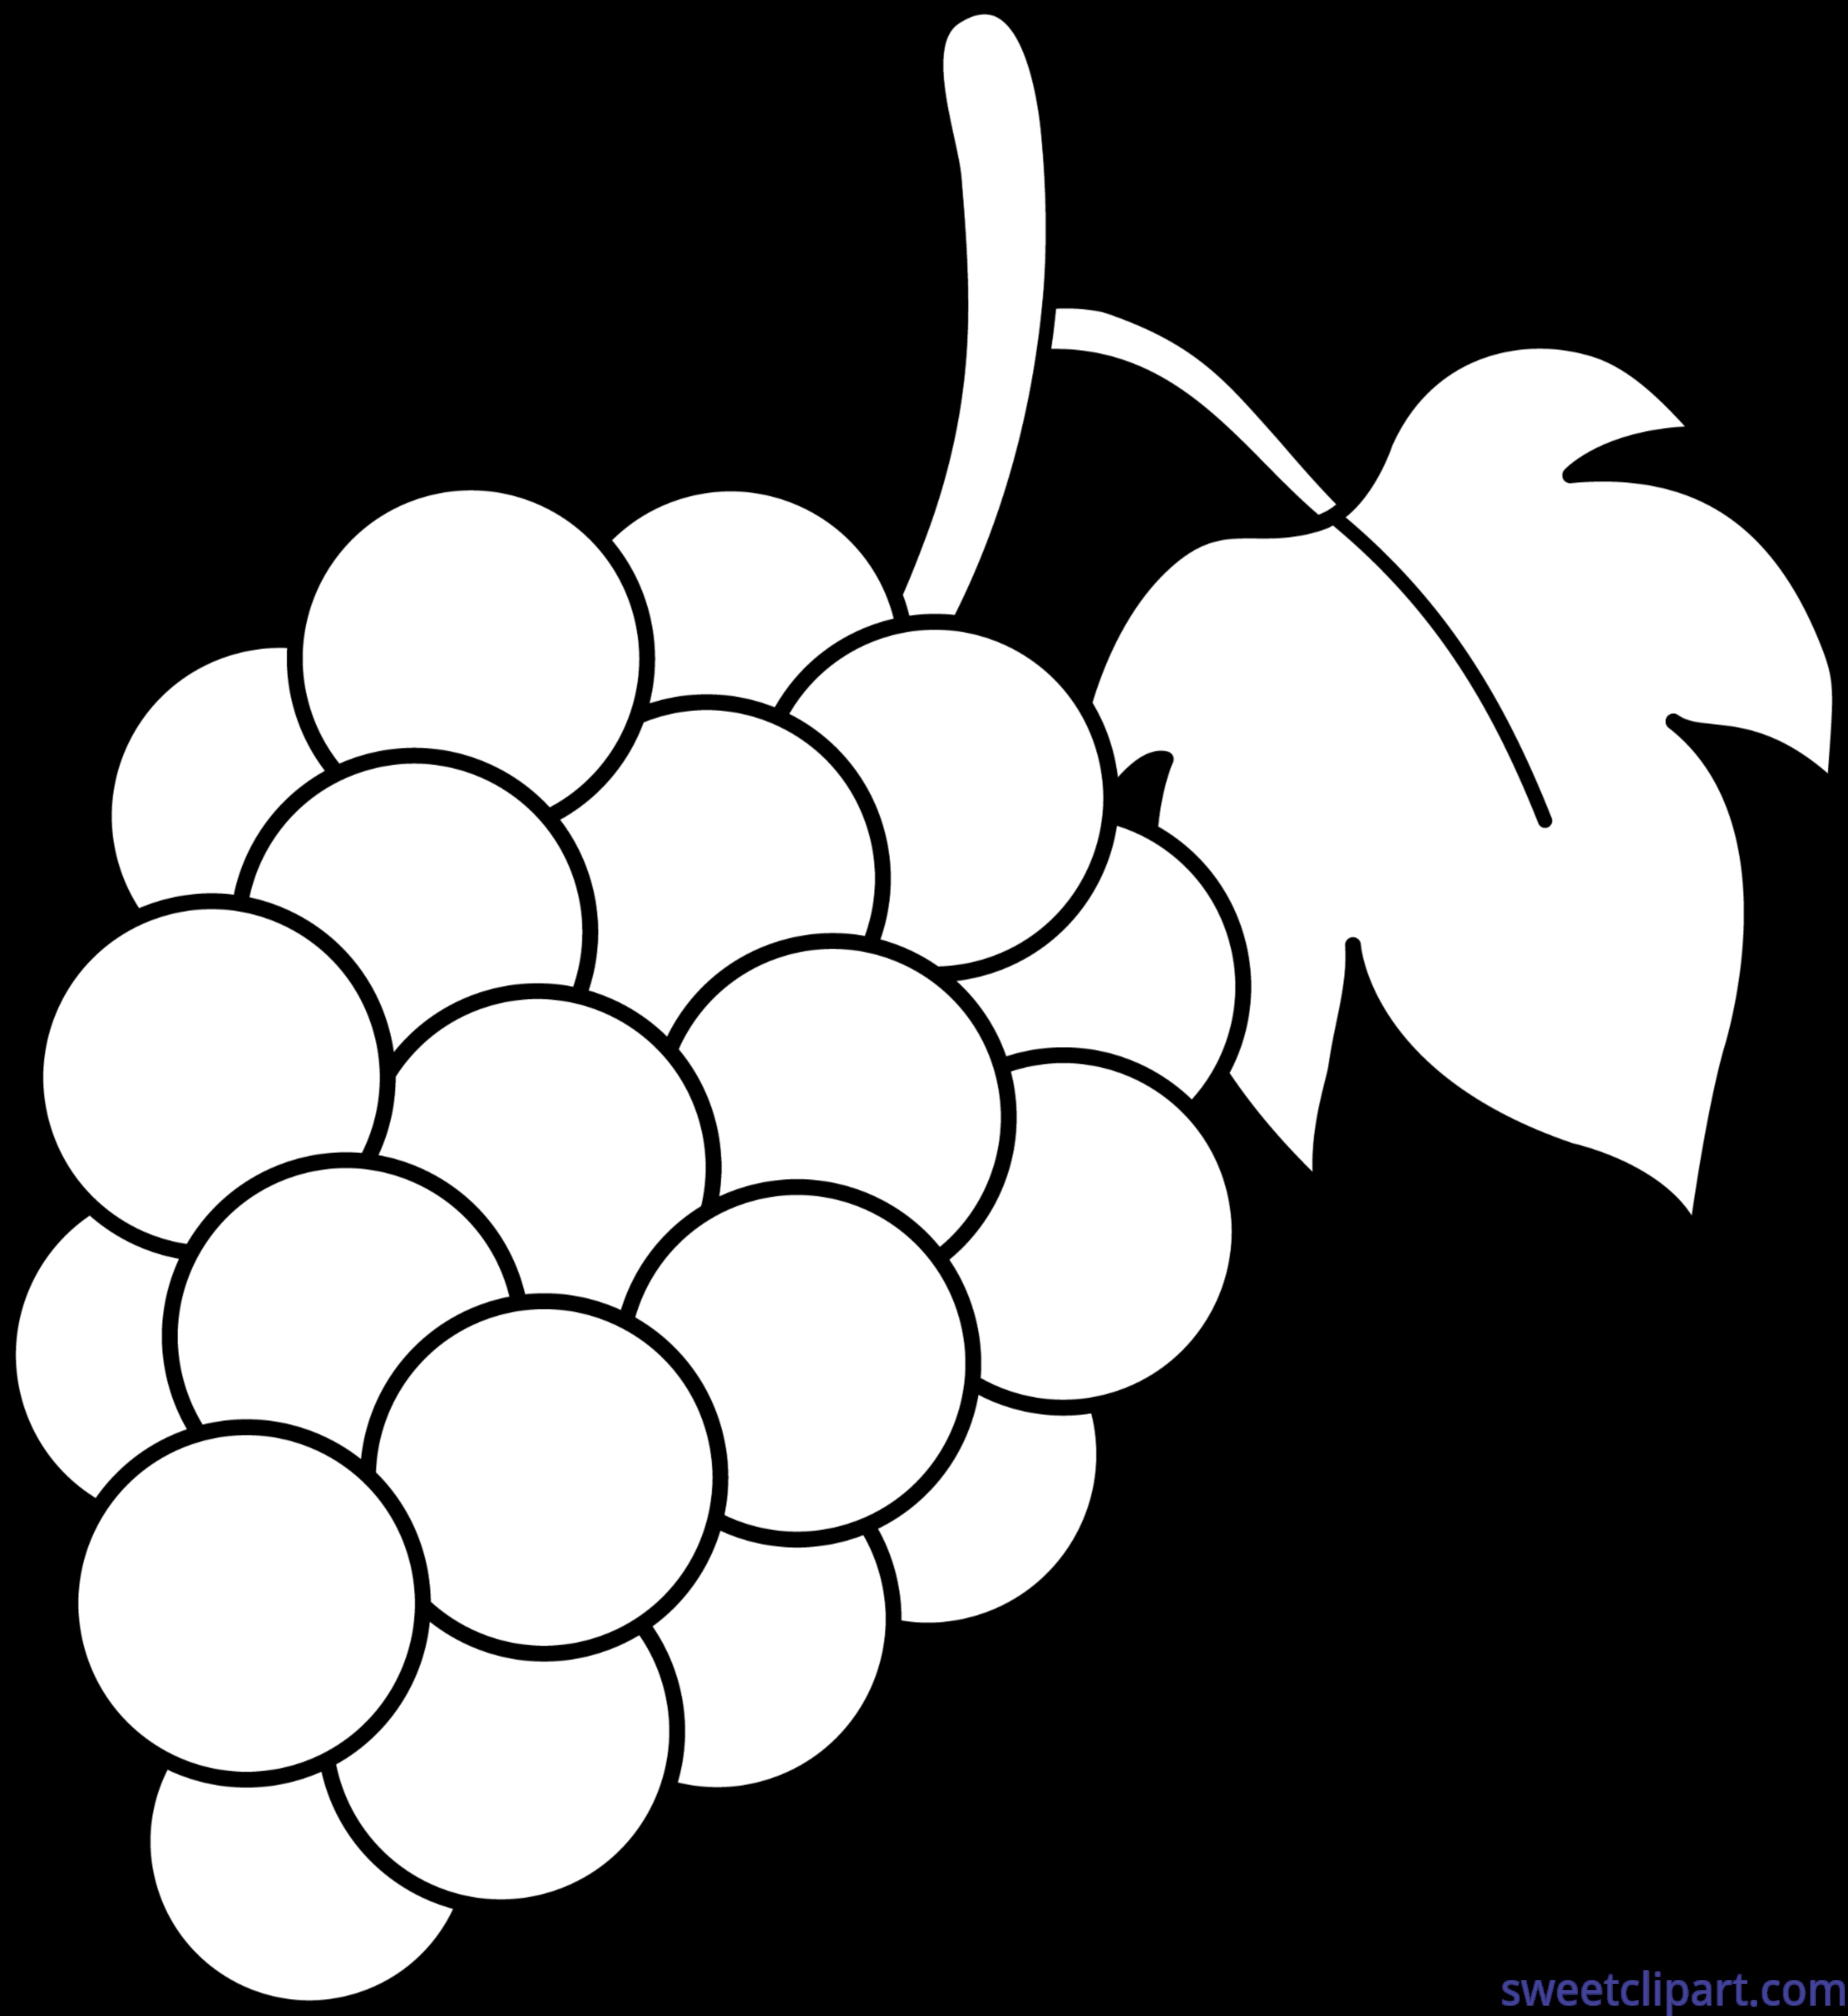 Grapes clipart line art. Lineart clip sweet